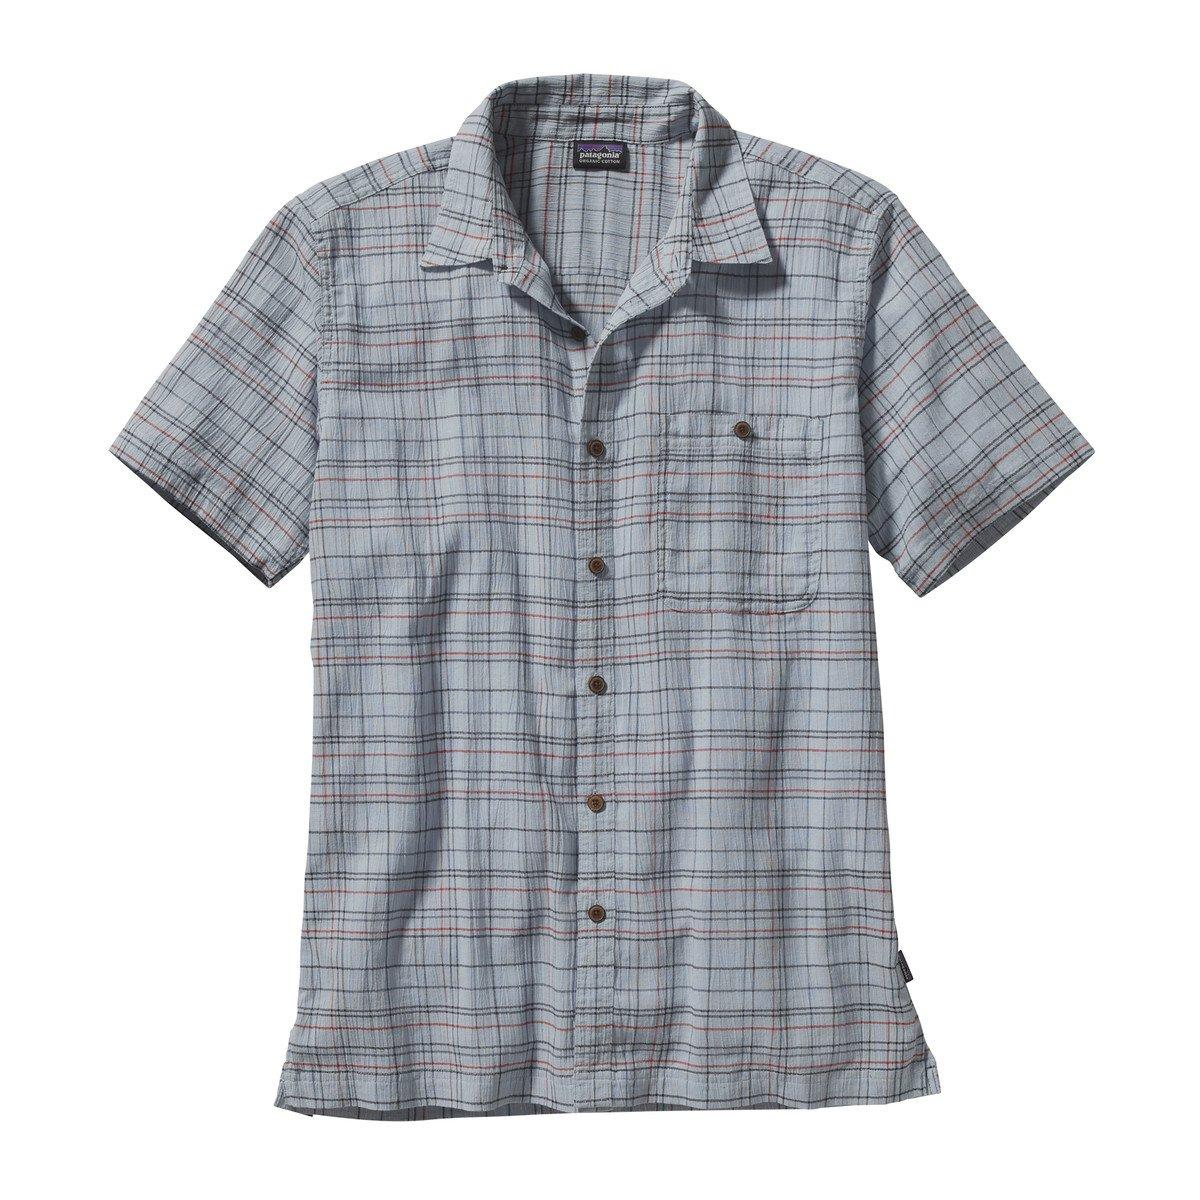 Patagonia Herren Kurzarmhemd Short Sleeve A/C